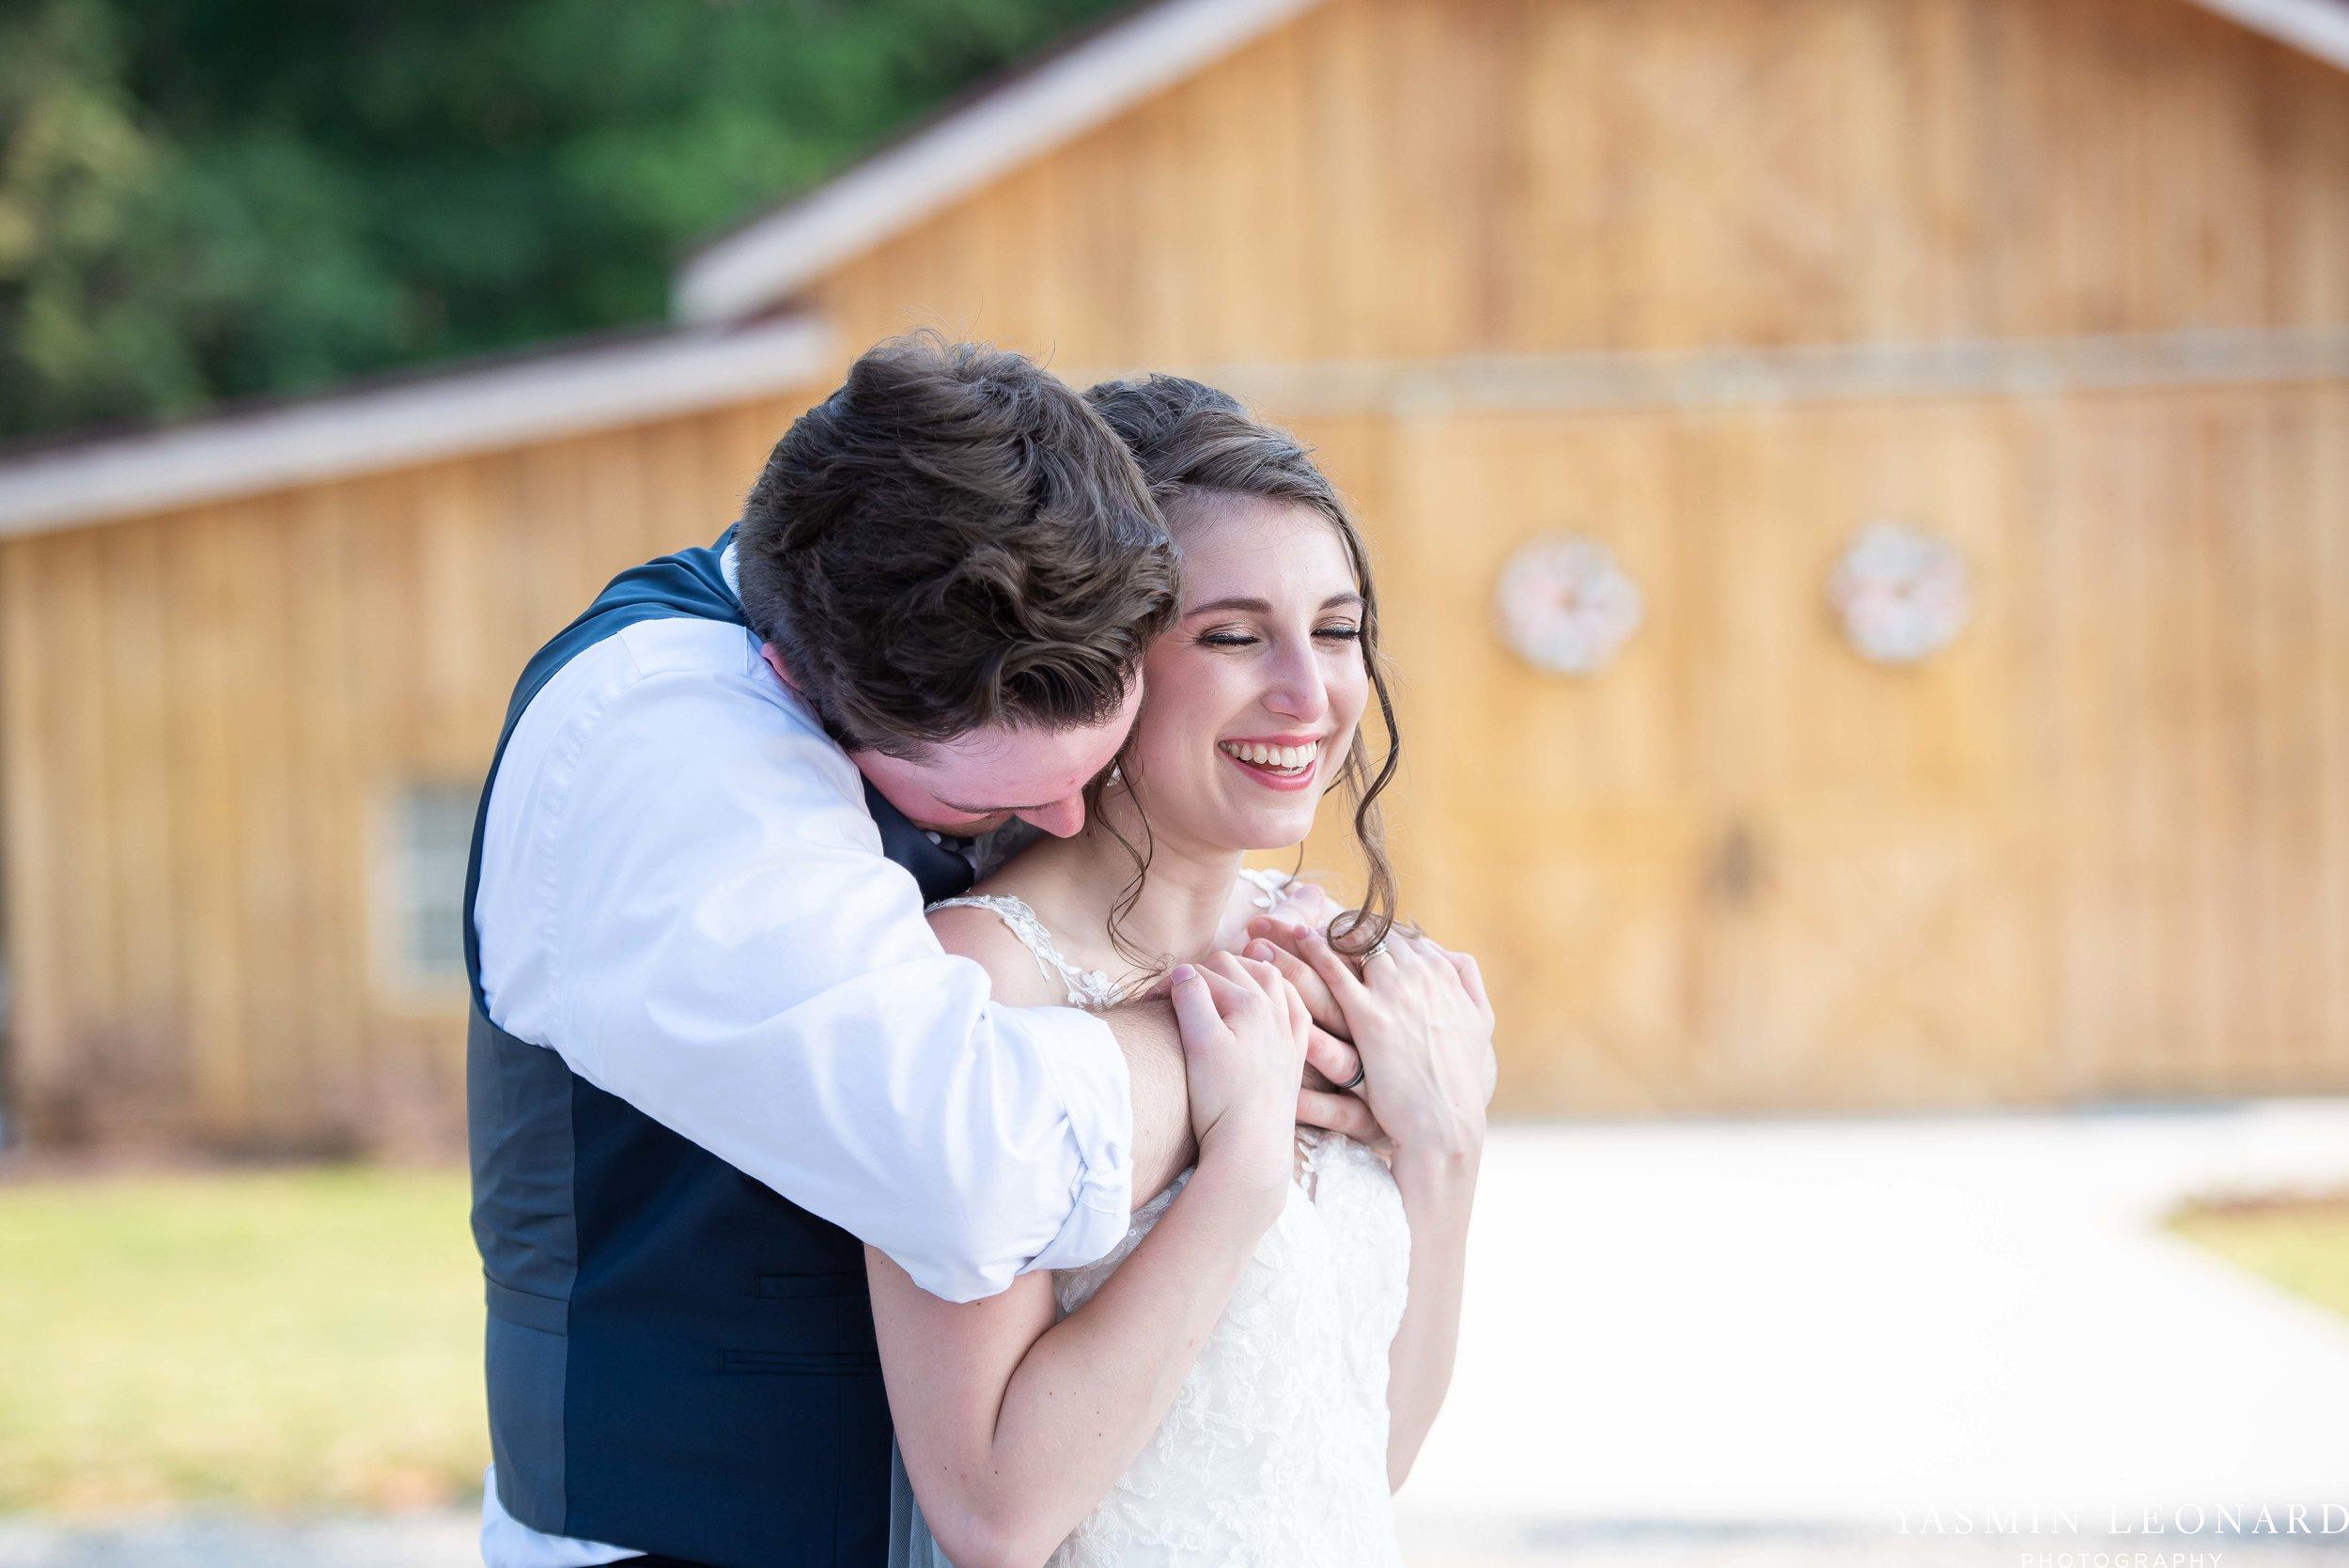 Old Homeplace Vineyard - NC Weddings - Outdoor Summer Weddings - Peony Boutique - Vineyard Wedding - NC Photographer - Yasmin Leonard Photography-39.jpg